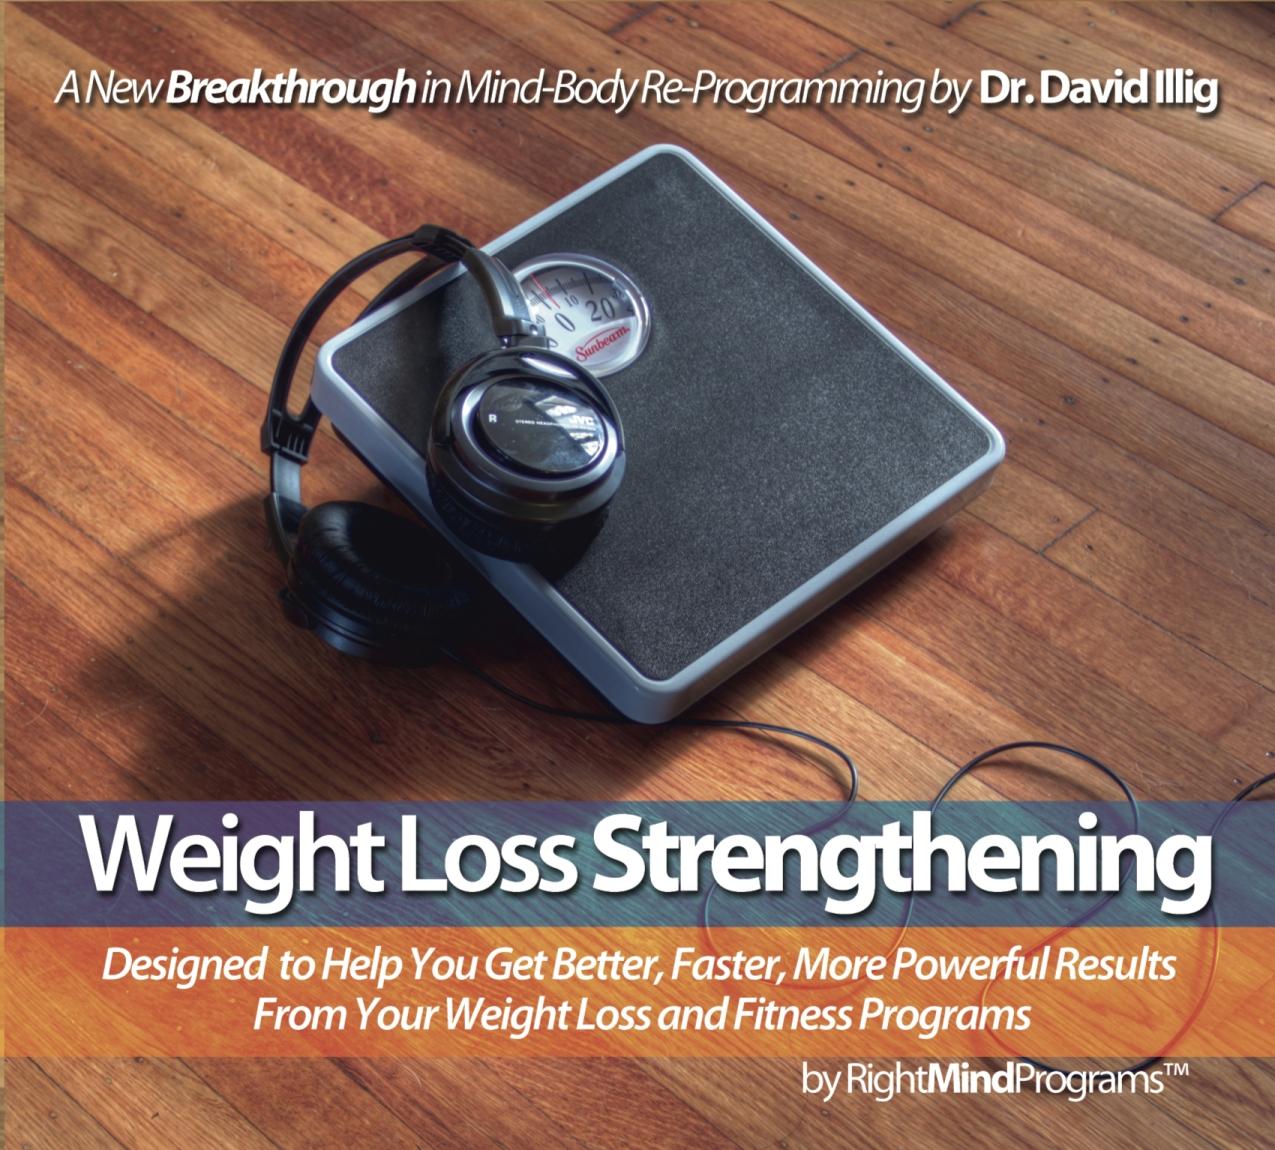 SuccessWorld | RightMind Weight Loss & Fitness Program